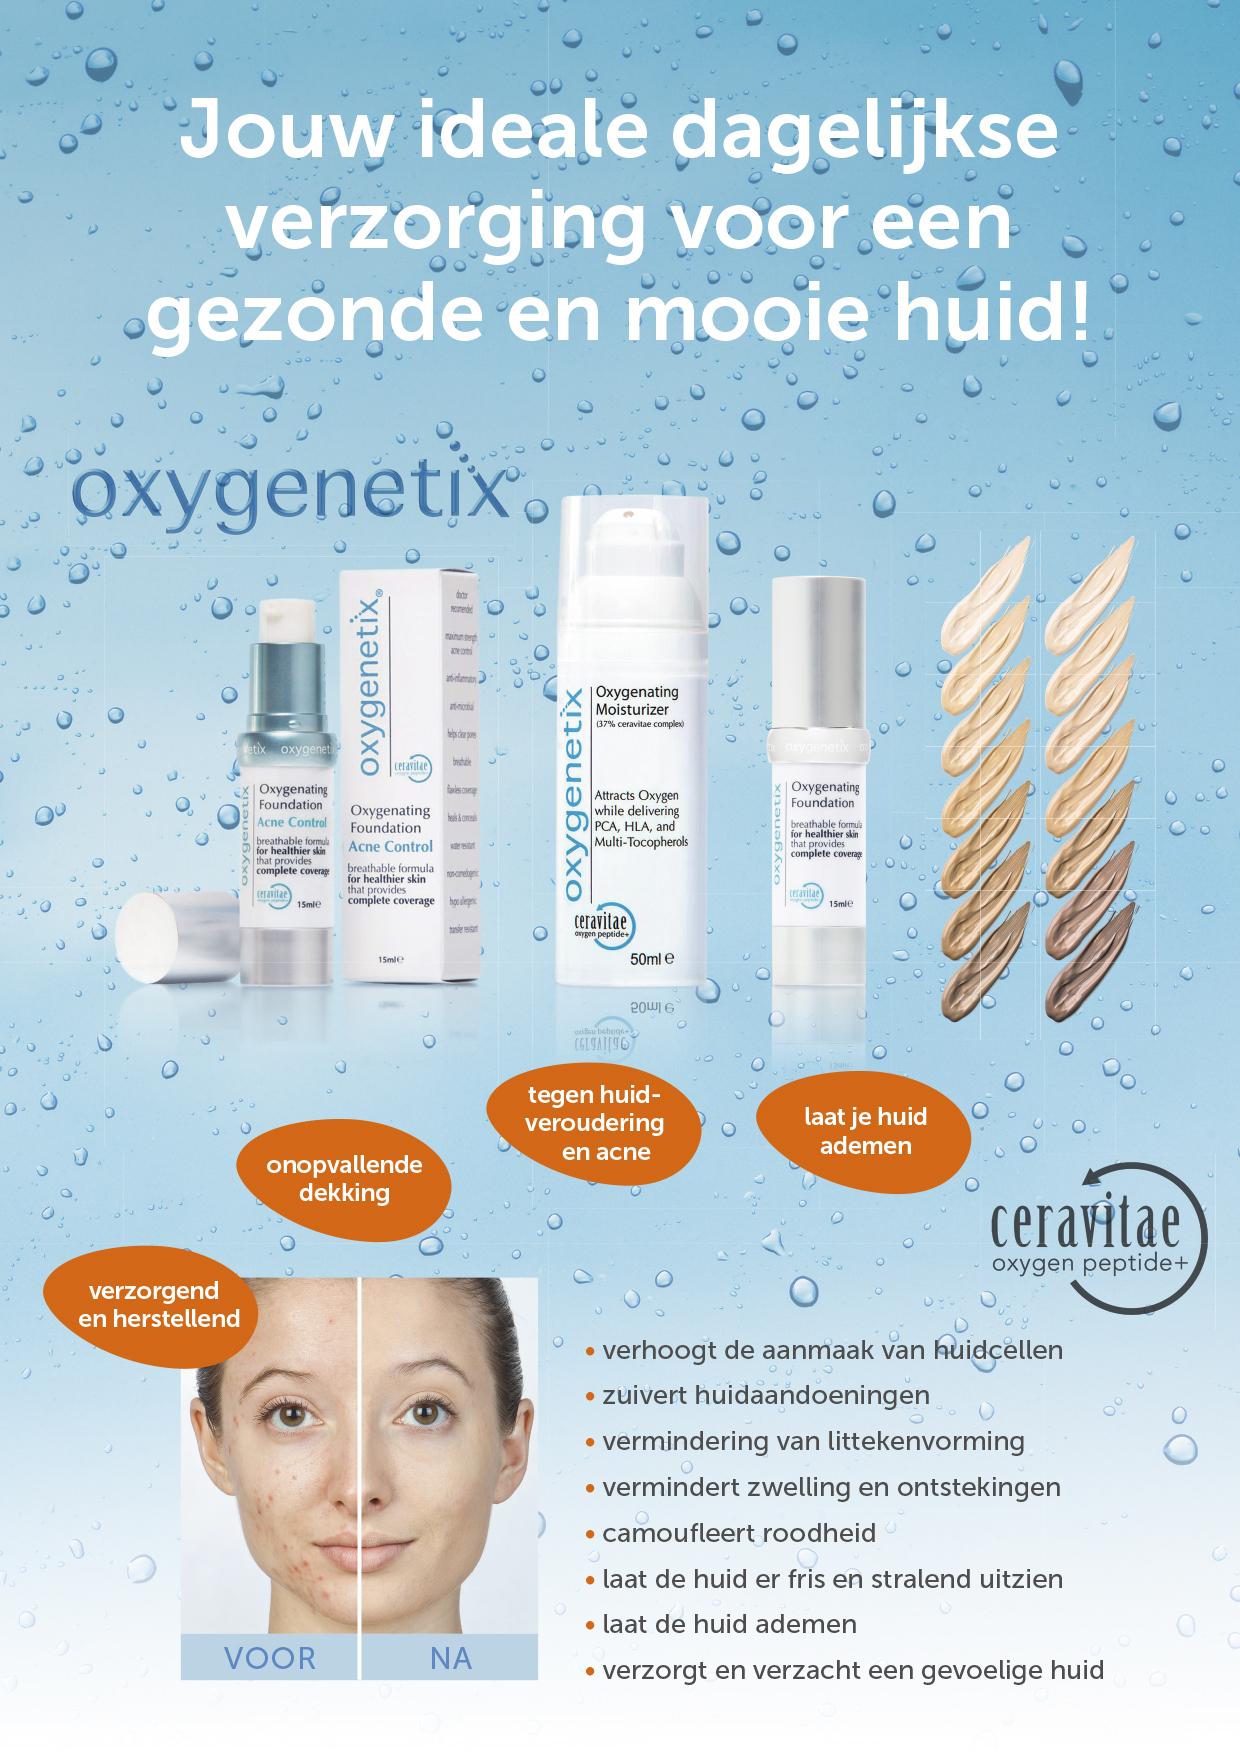 Oxygenetix